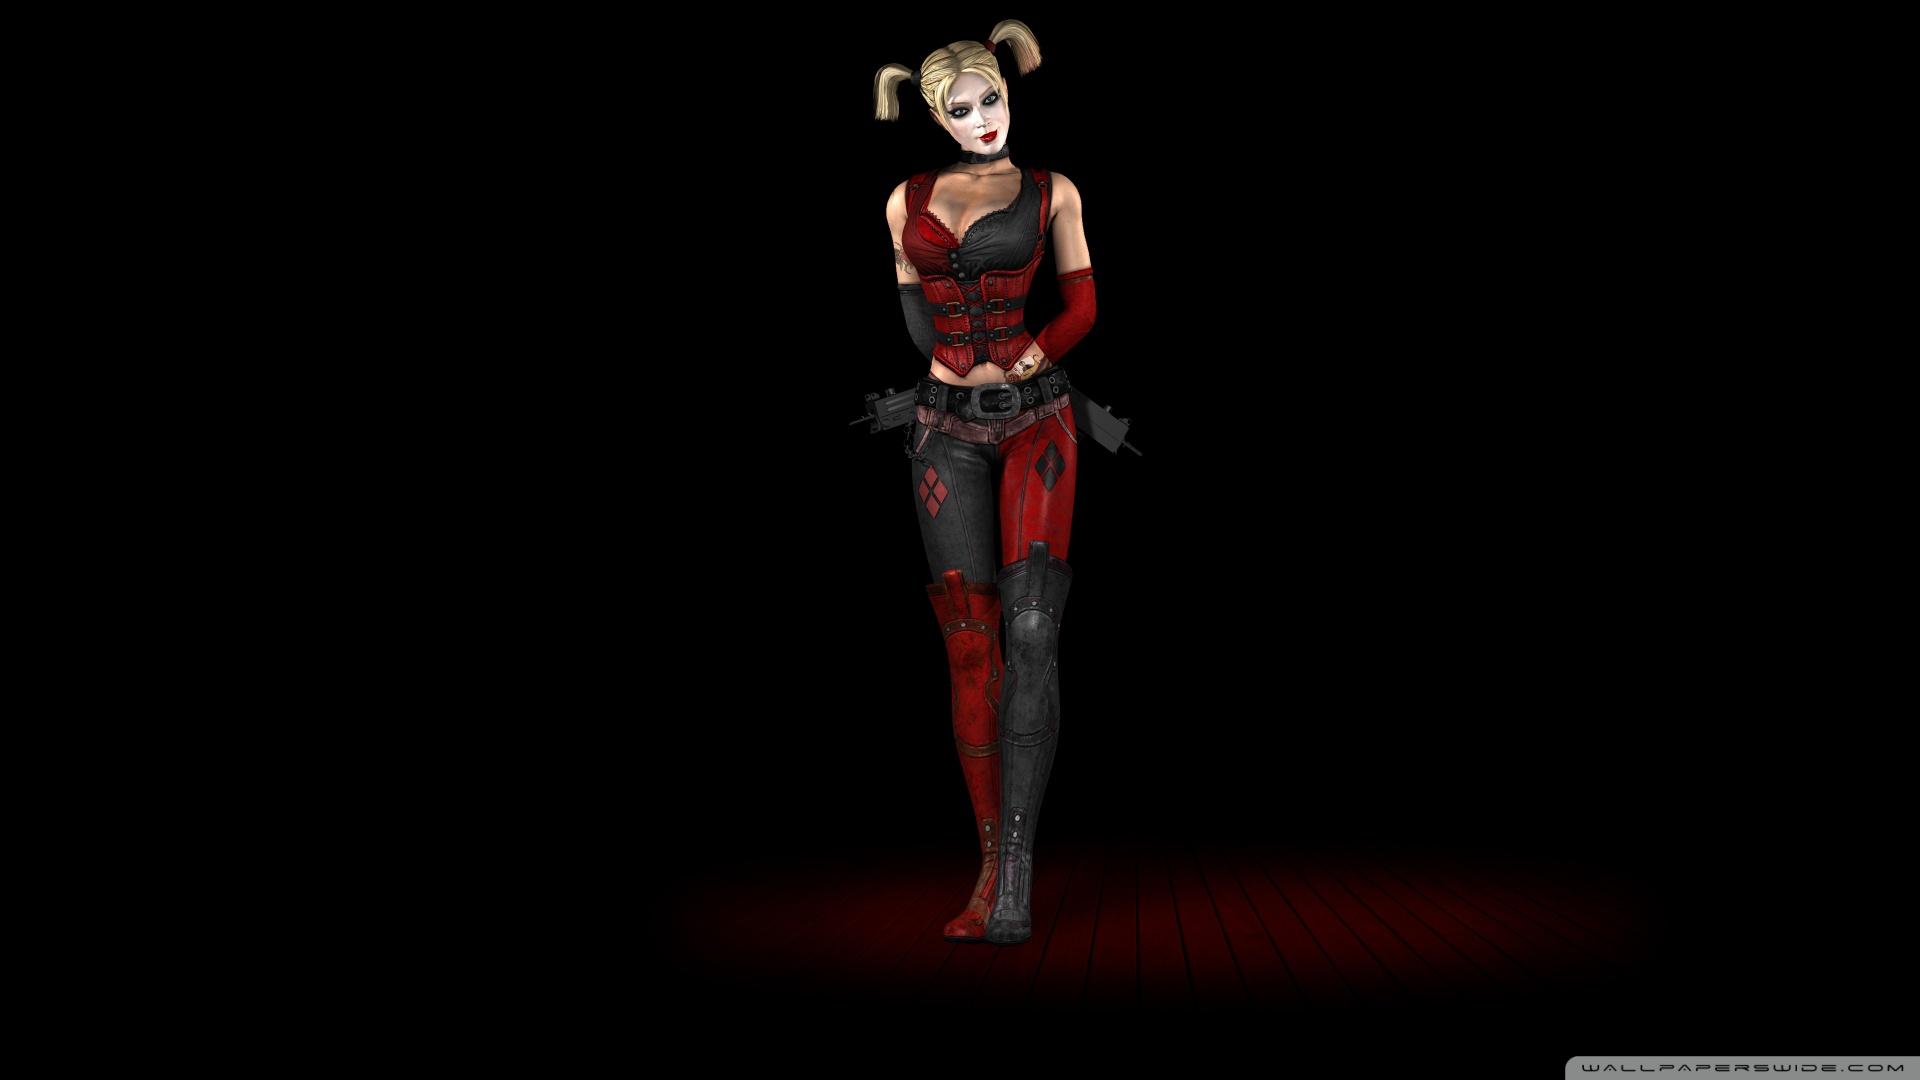 Harley Quinn Batman Arkham Harley Quinn Batman Arkham City Wallpaper 1920x1080